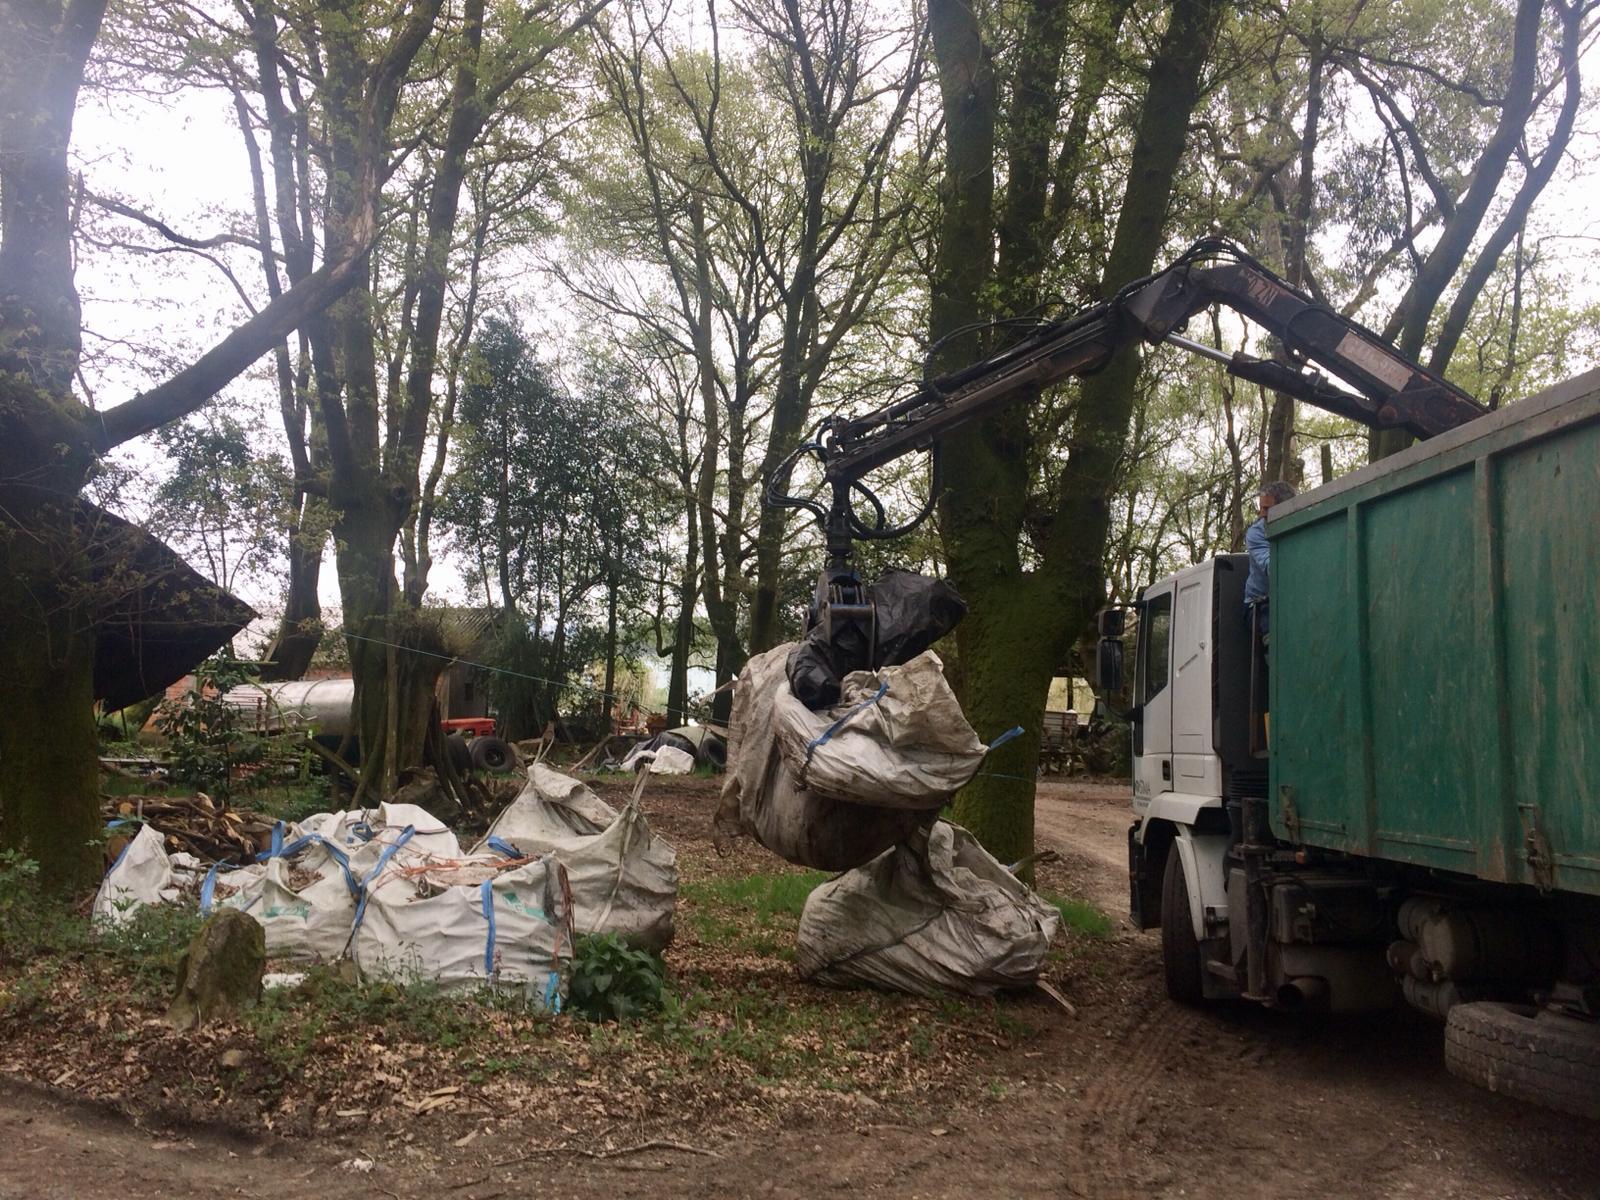 O Concello de Silleda retirou este ano preto de 100.000 kilos de plásticos agrícolas